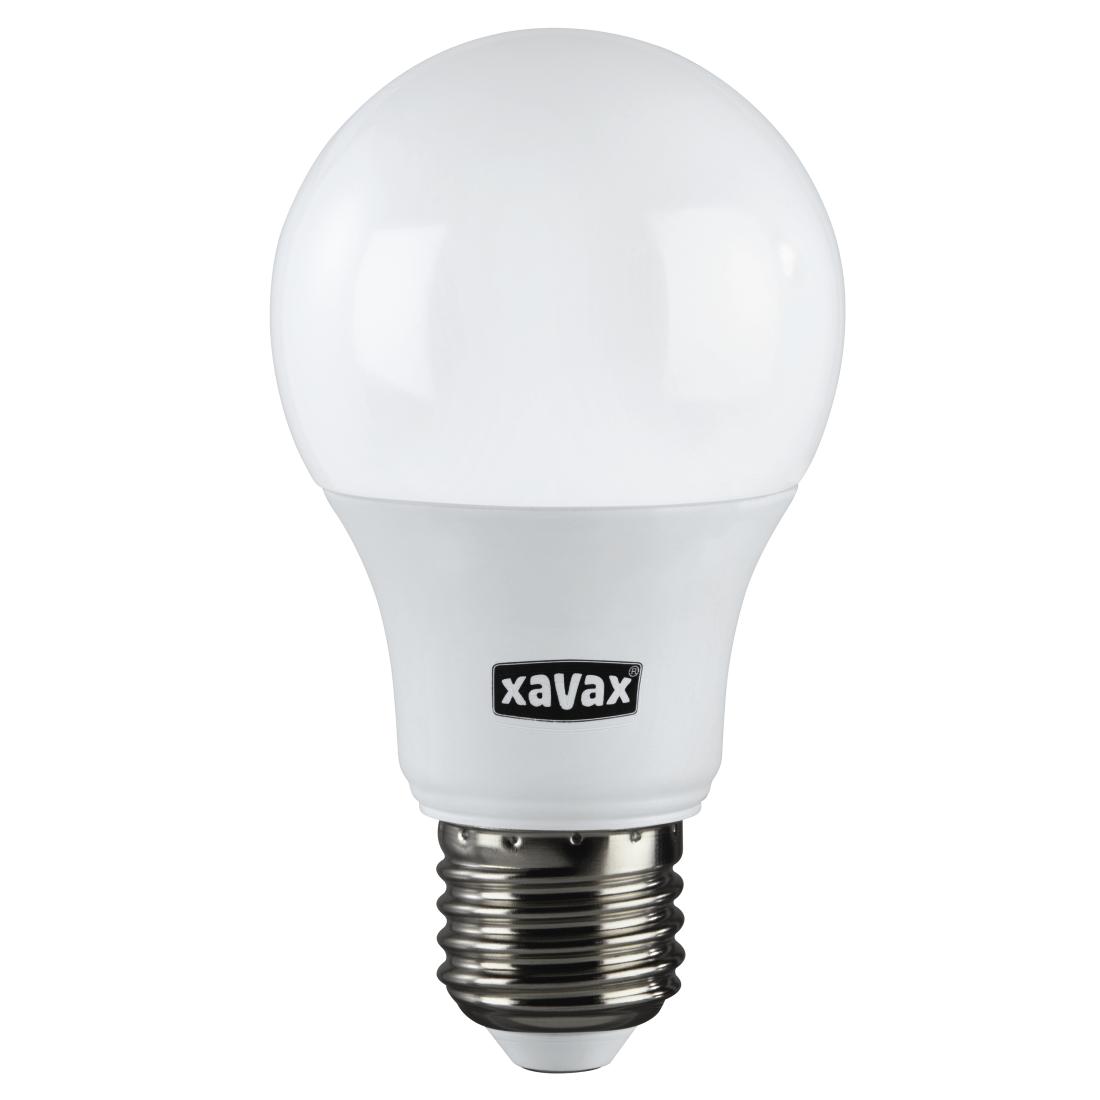 xavax.eu | 00112502 Xavax LED-Lampe, E27, 480lm ersetzt 40W ...